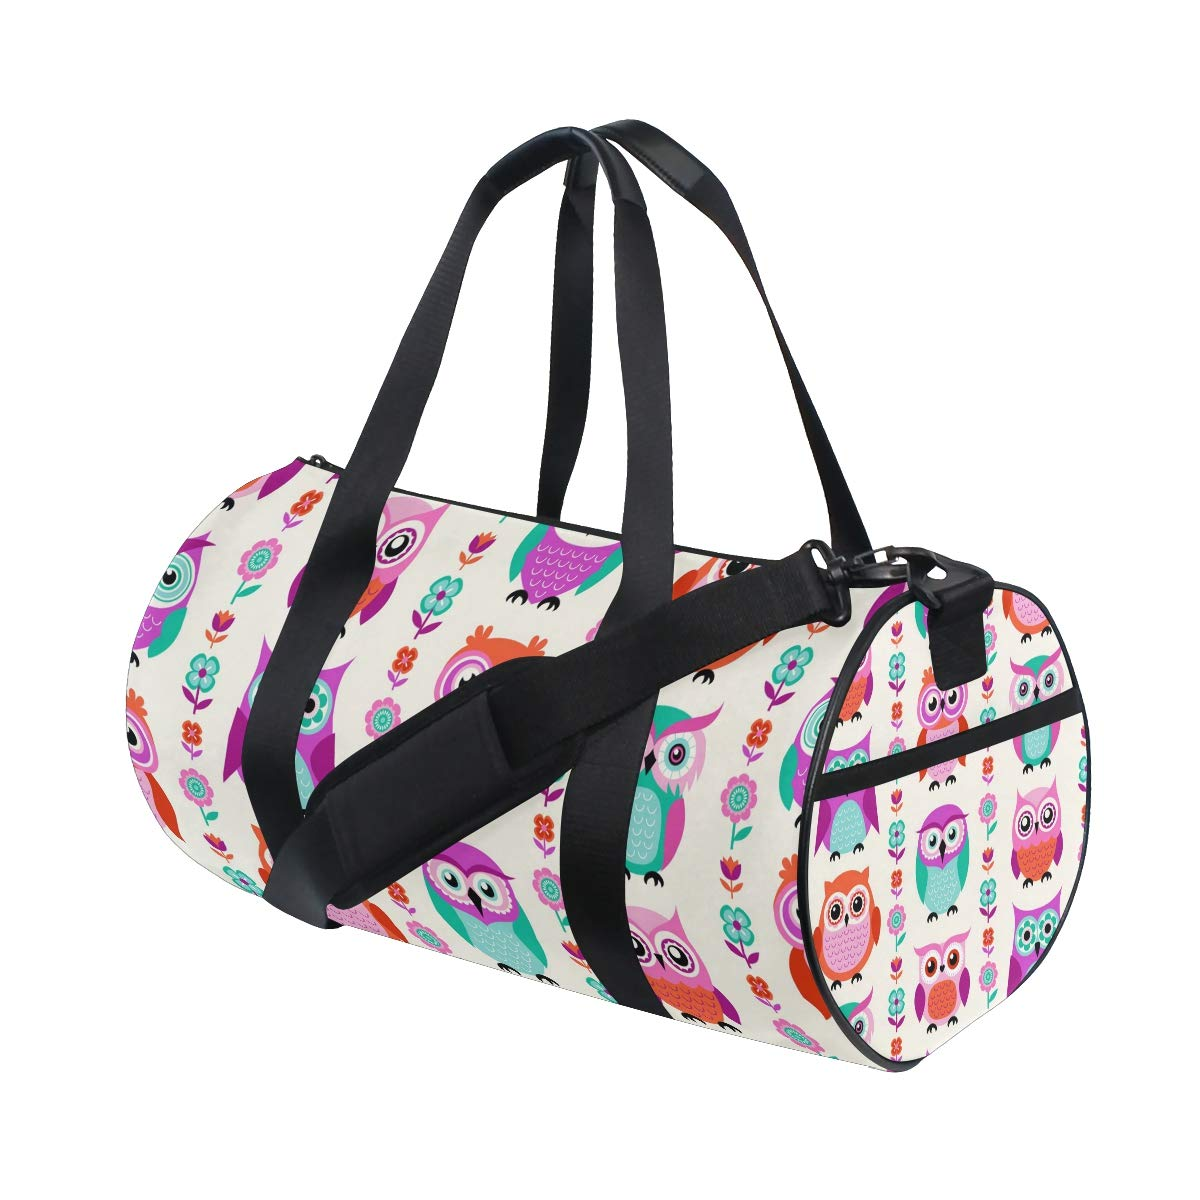 WIHVE Gym Duffel Bag Color Funny Cartoon Owls Flowers Sports Lightweight Canvas Travel Luggage Bag